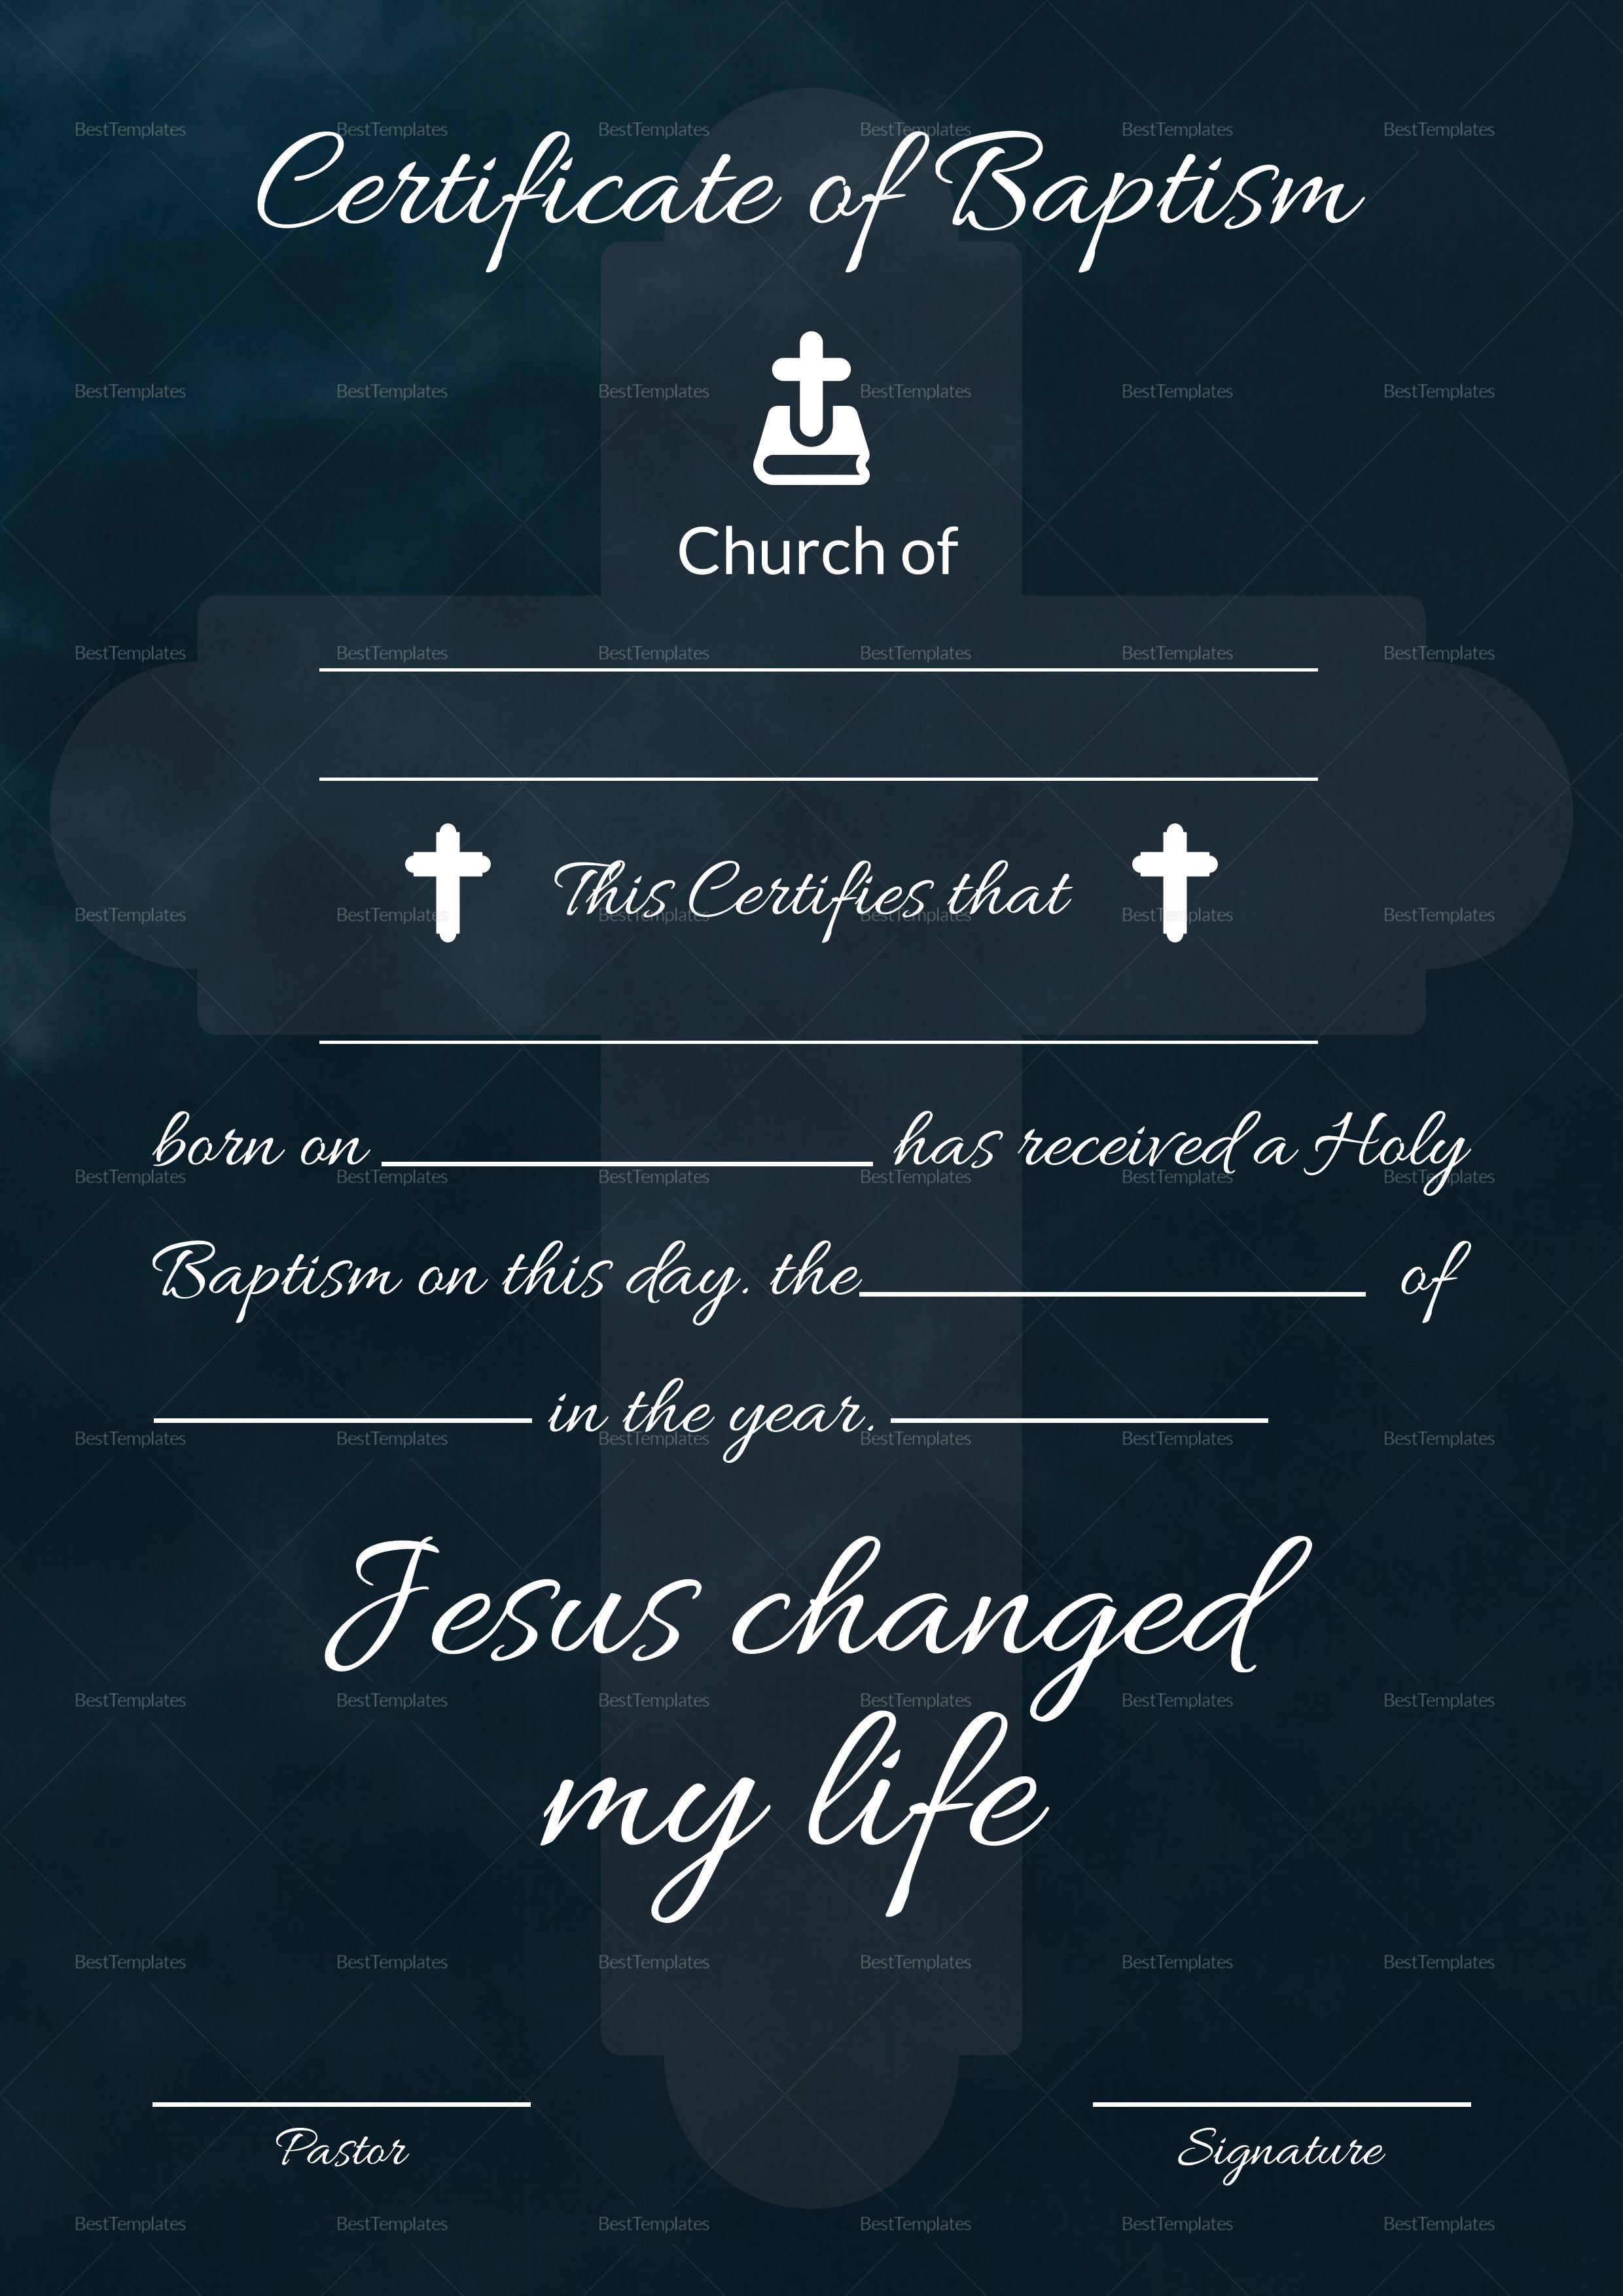 Baptismal Certificate Template In Adobe Photoshop Microsoft Word